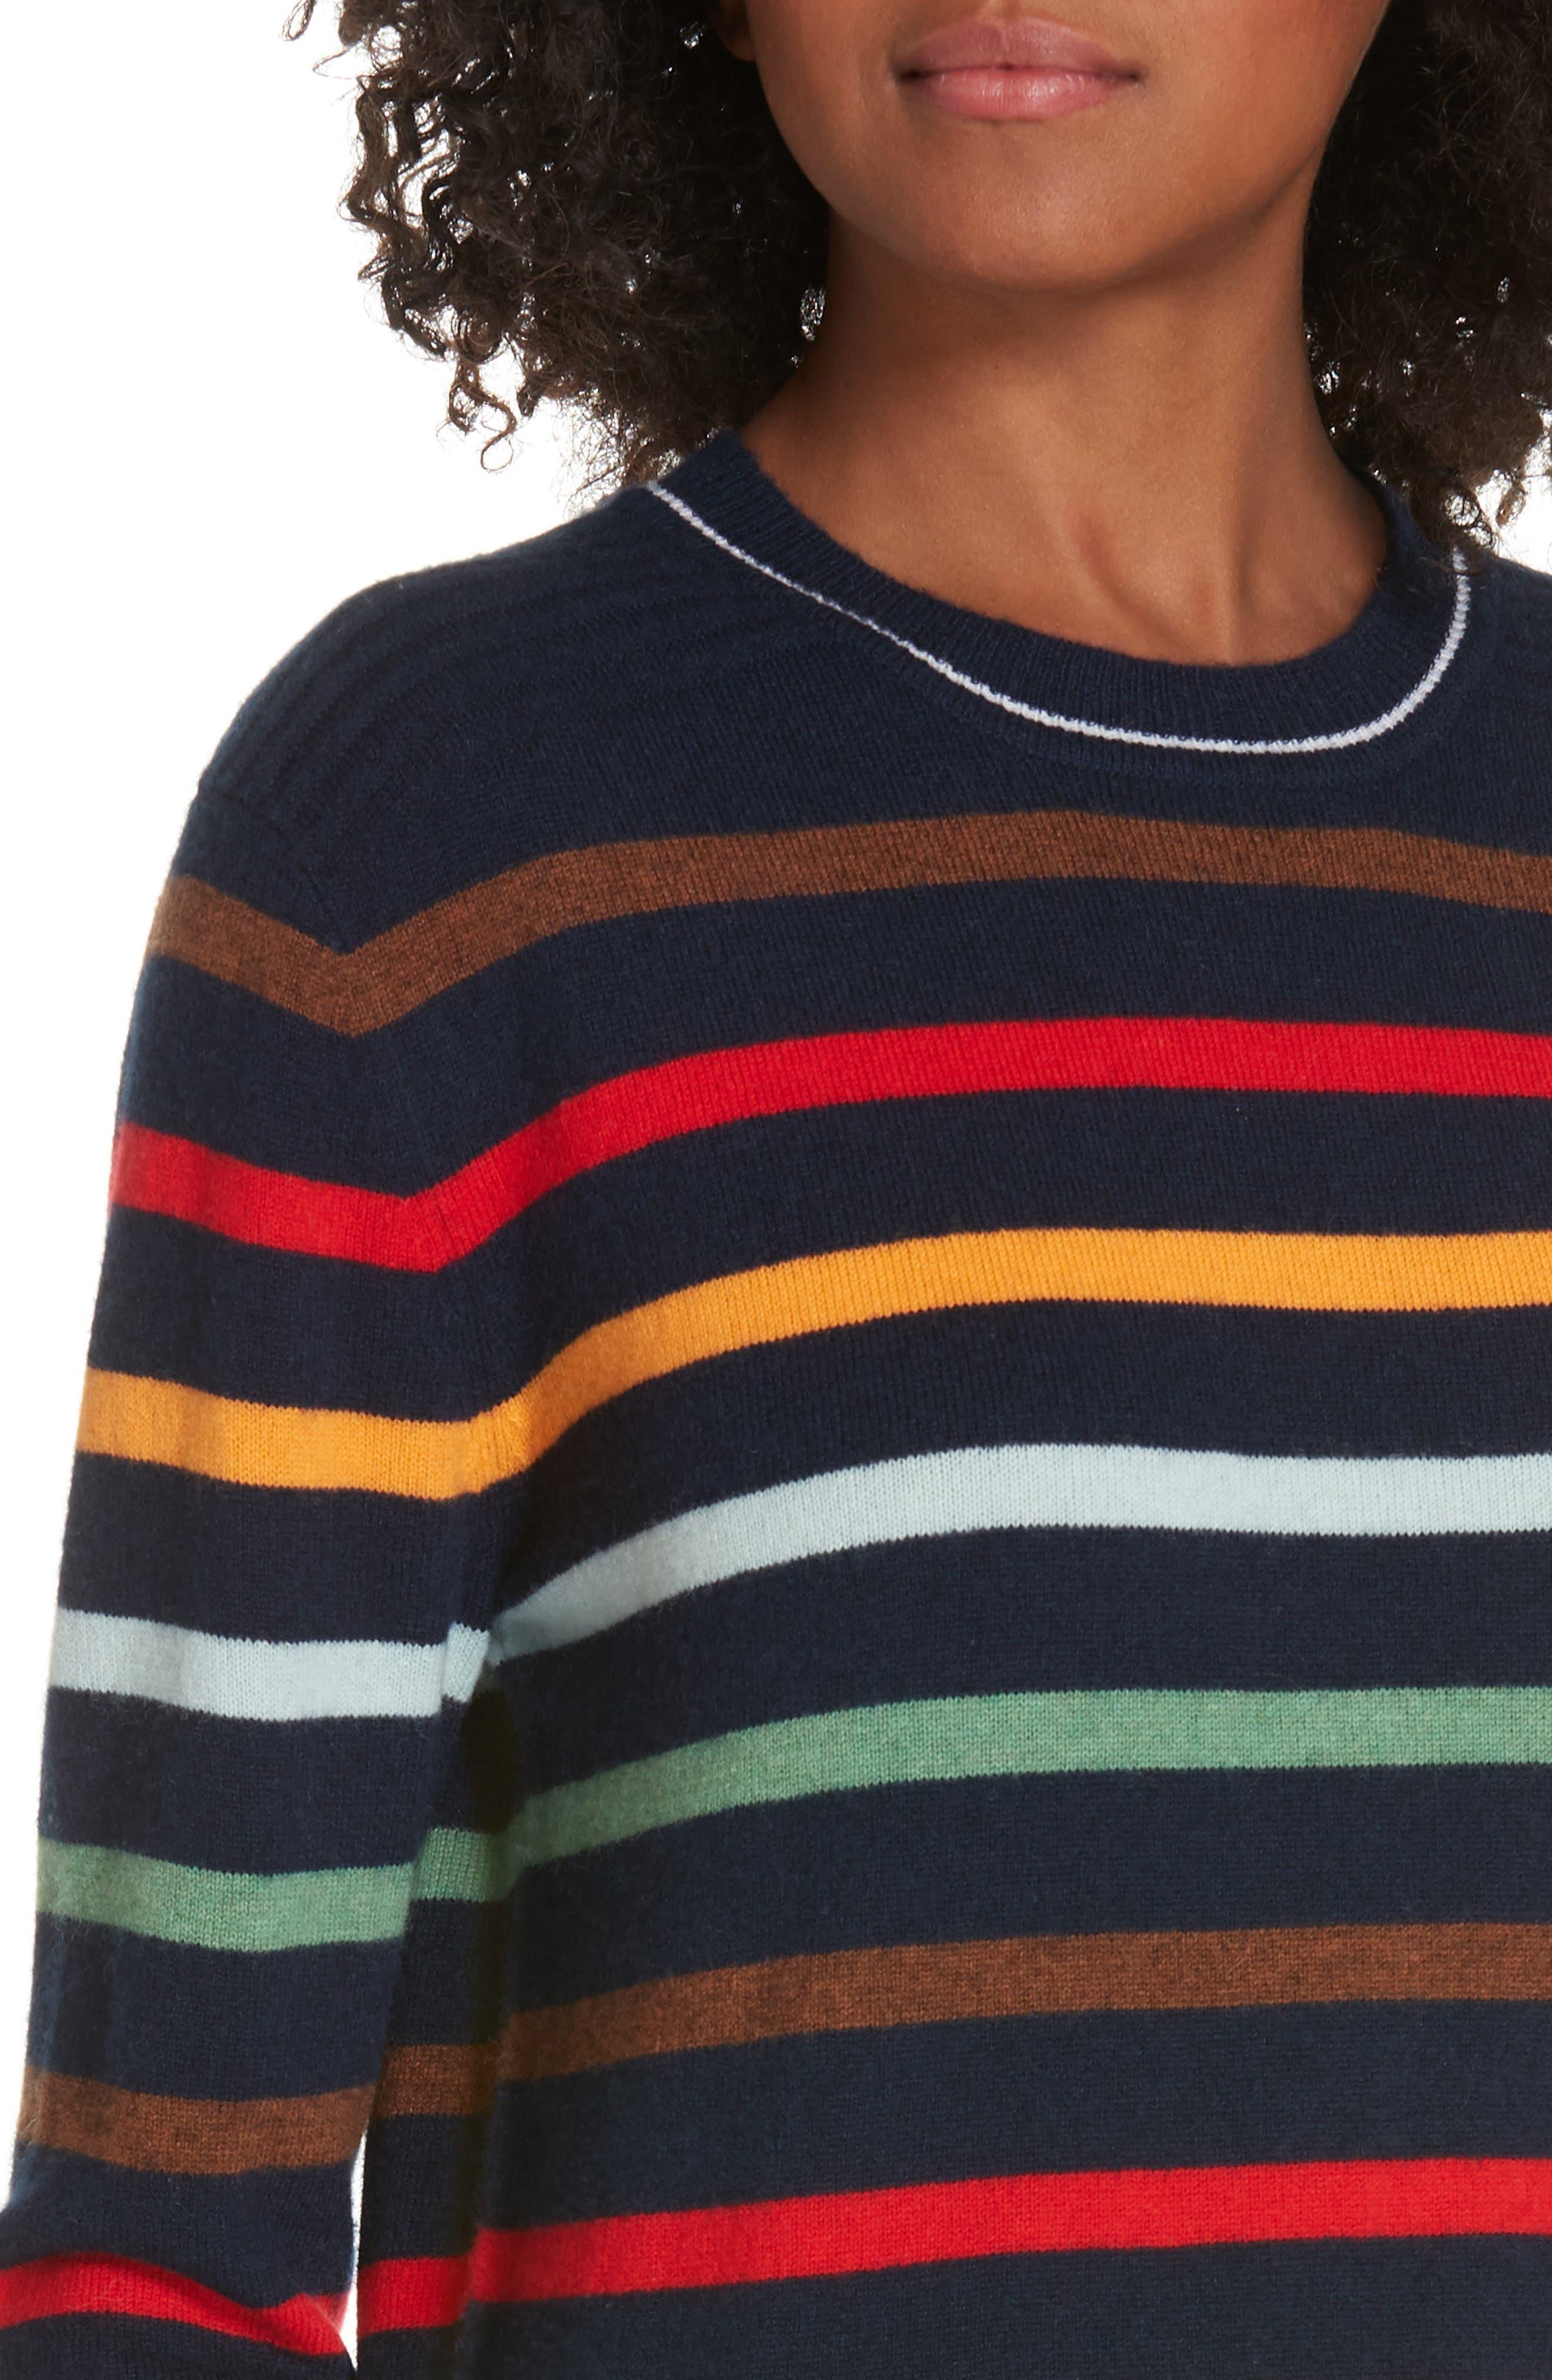 Rainbow Neat Wool & Cashmere Sweater,                             Alternate thumbnail 4, color,                             NAVY/ RAINBOW